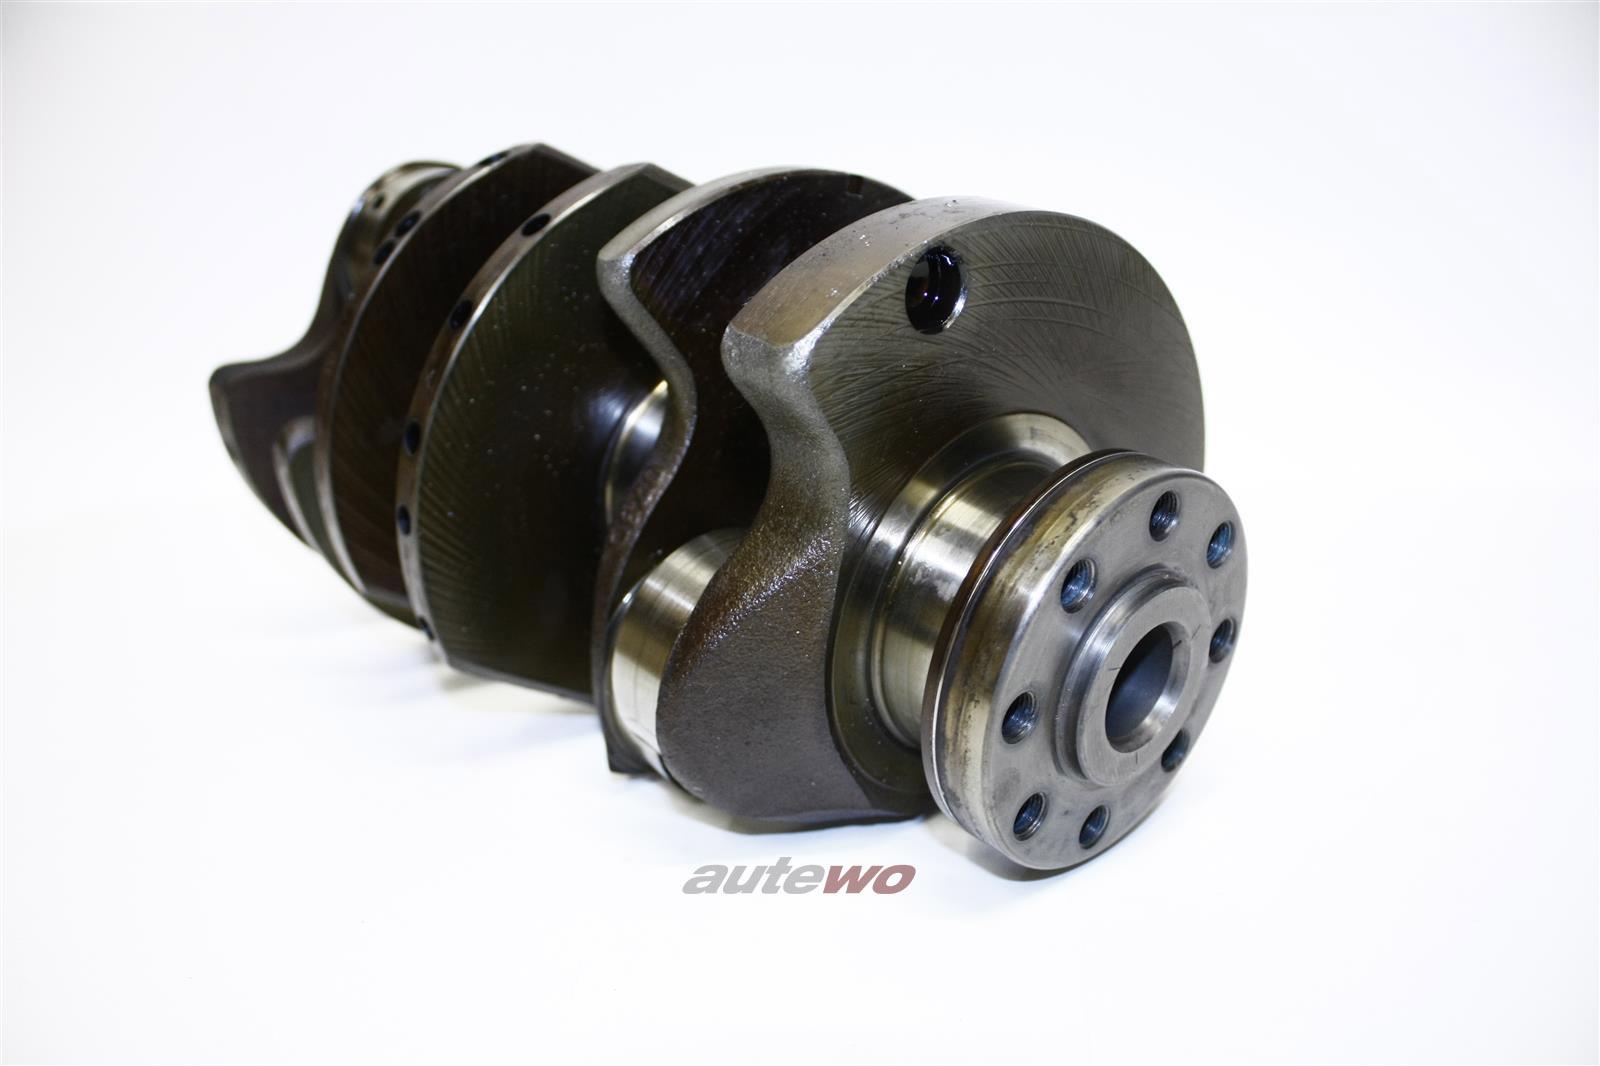 Audi 80/A4/A6 C4/A8 2.8l 174PS 6 Zylinder AAH Kurbelwelle 078105101AF 139000km